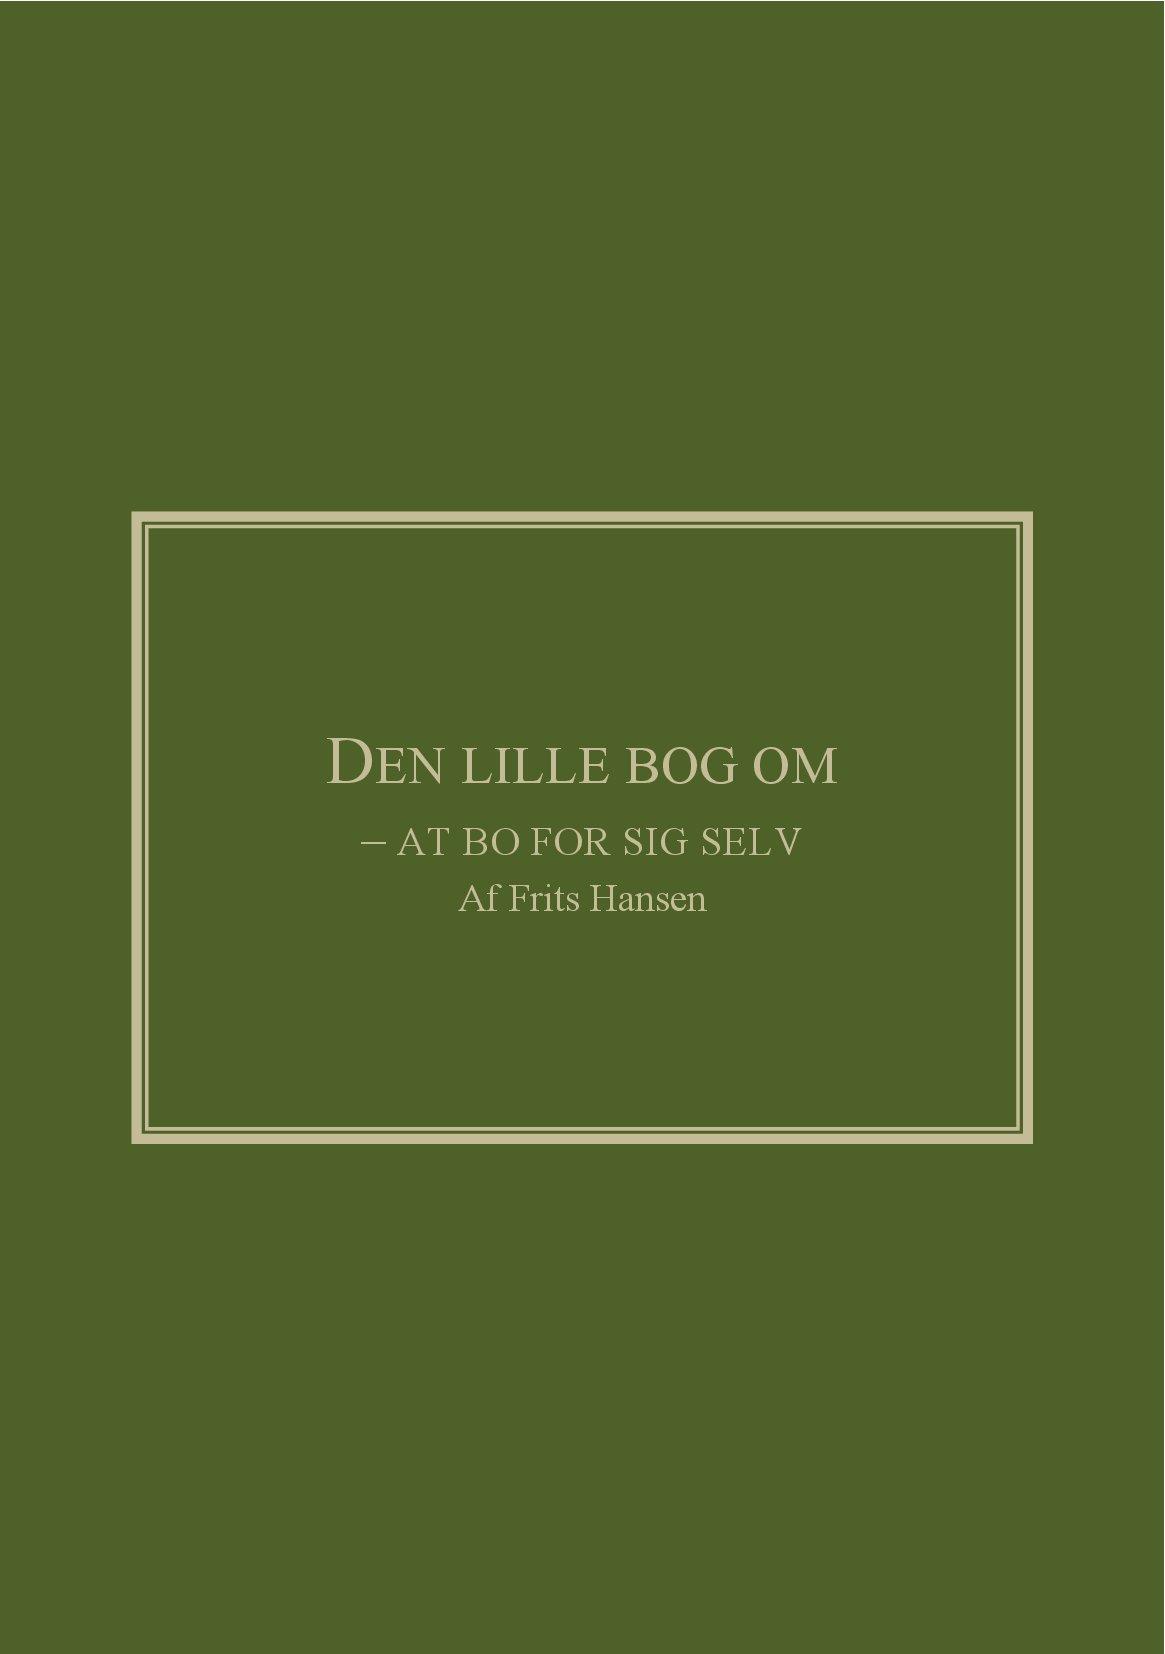 N/A Den lille bog om - at bo for sig selv - e-bog fra bog & mystik